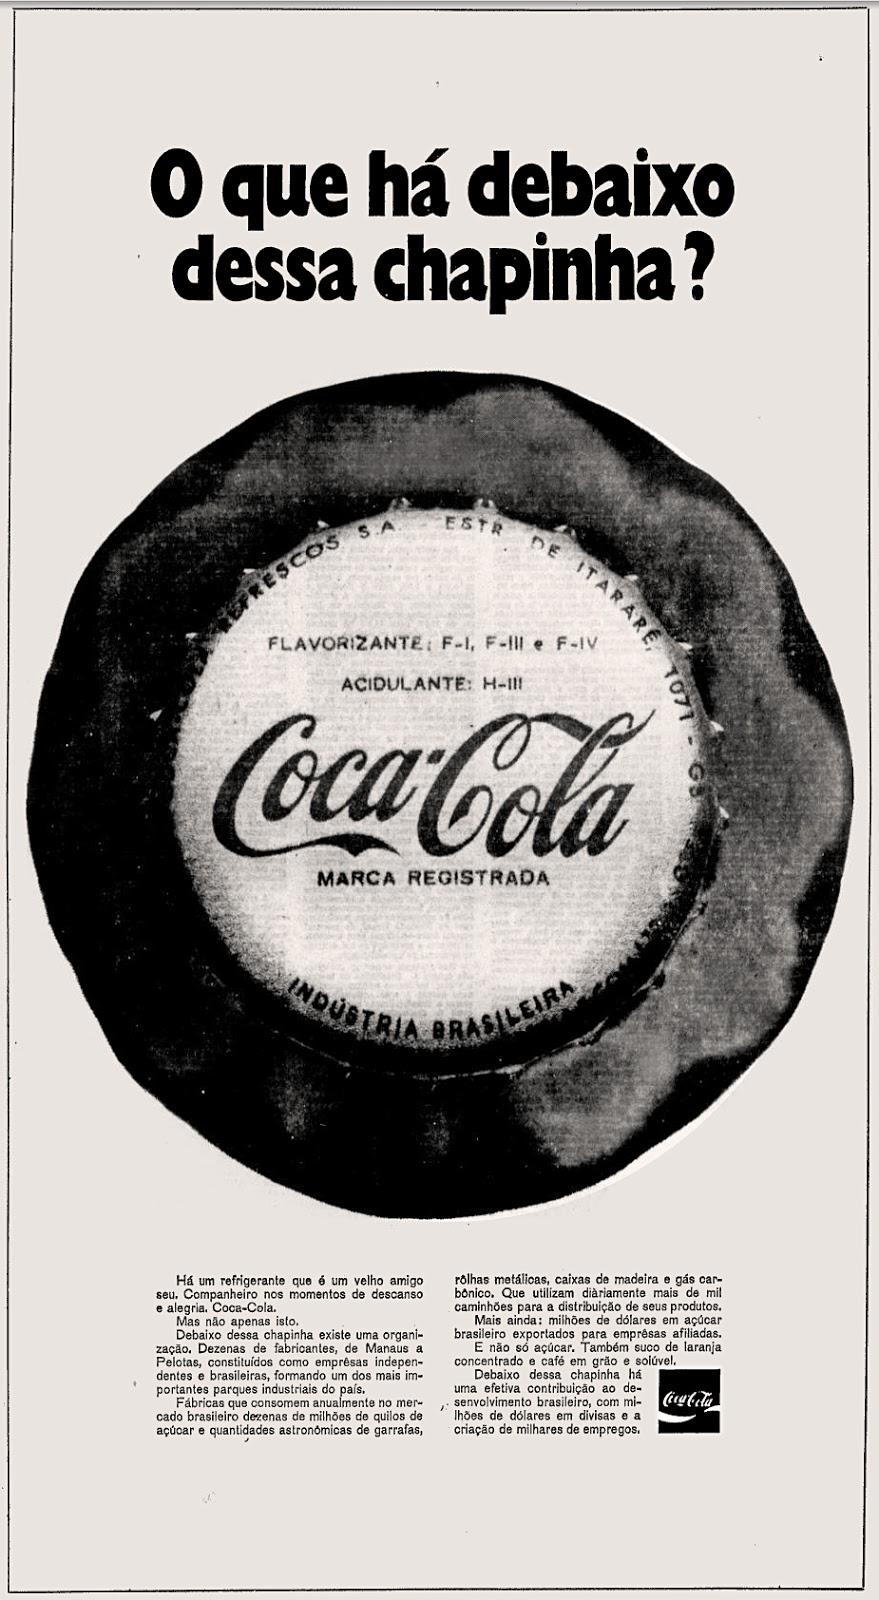 Coca Cola; os anos 70; propaganda na década de 70; Brazil in the 70s, história anos 70; Oswaldo Hernandez;